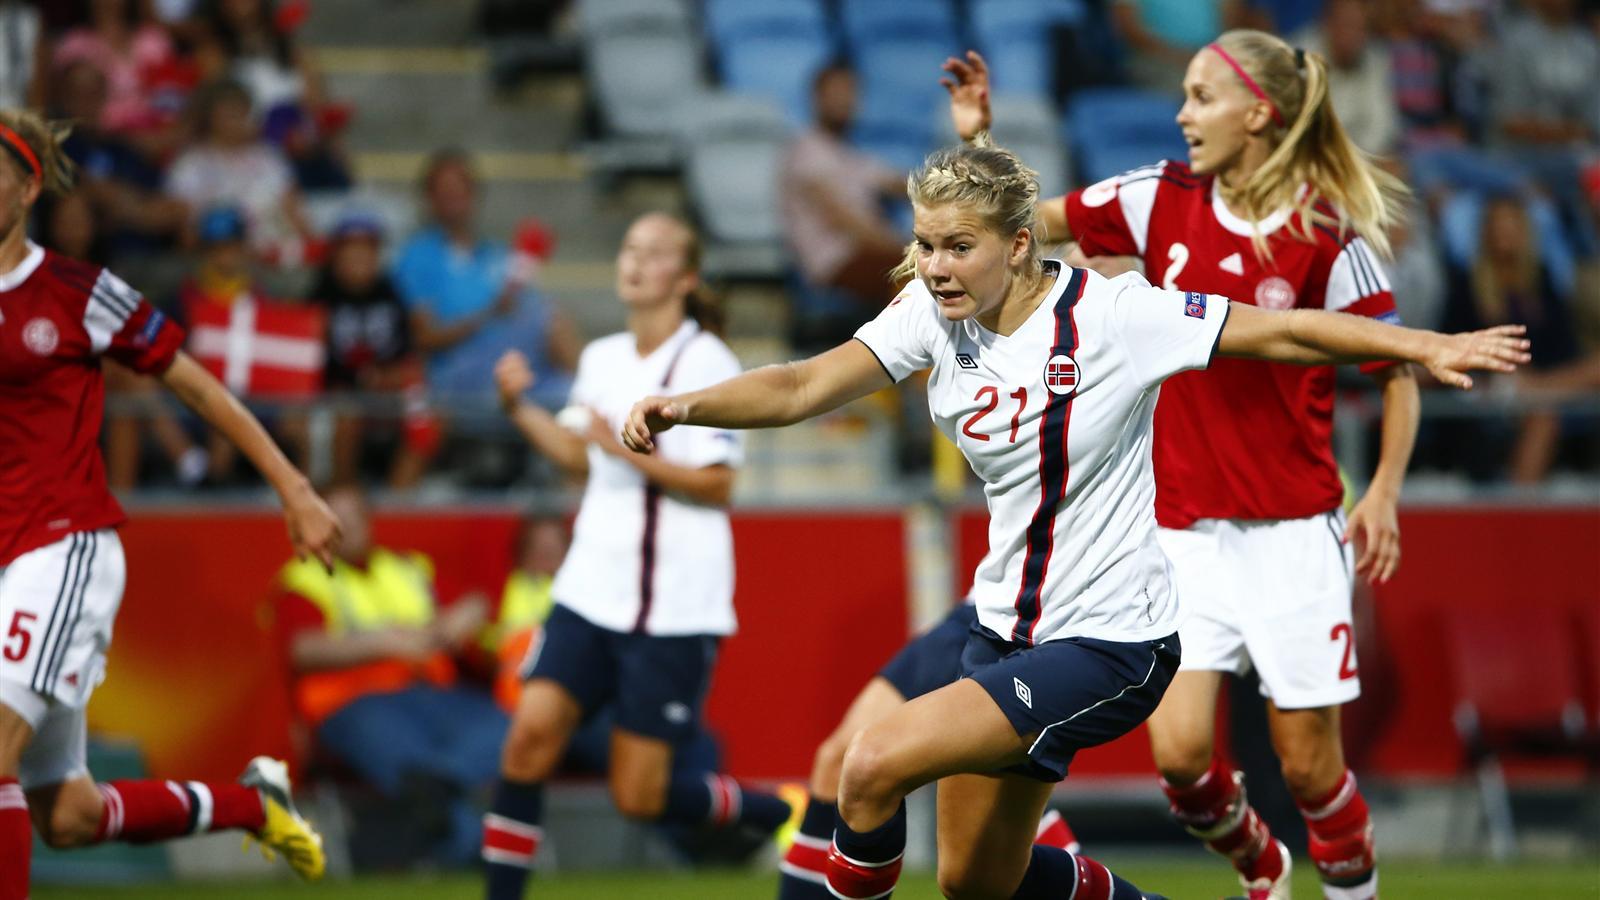 La norv ge au bout du suspense football f minin 2013 football eurosport - Coupe d europe de basket feminin ...